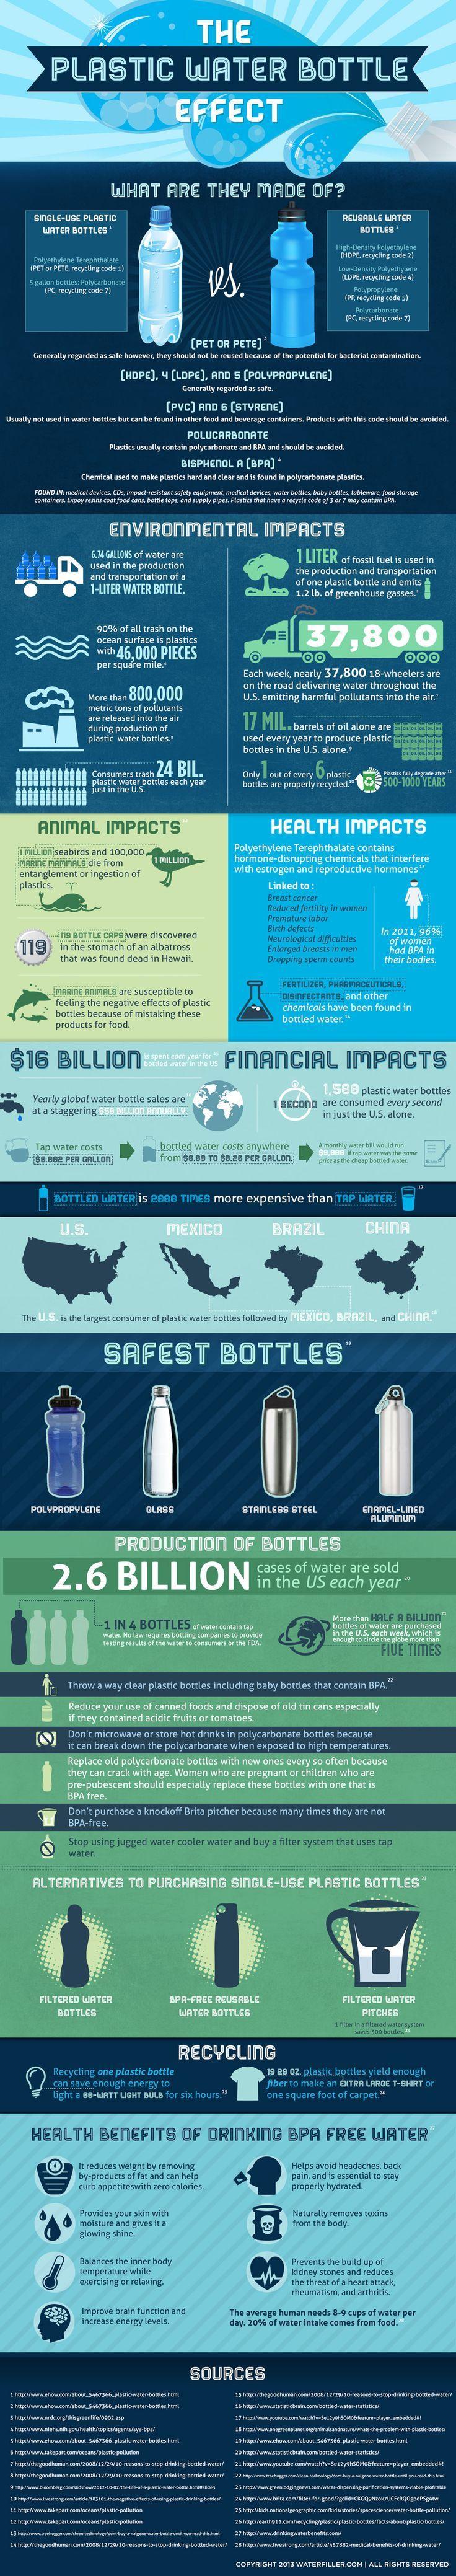 The plastic water bottle effect